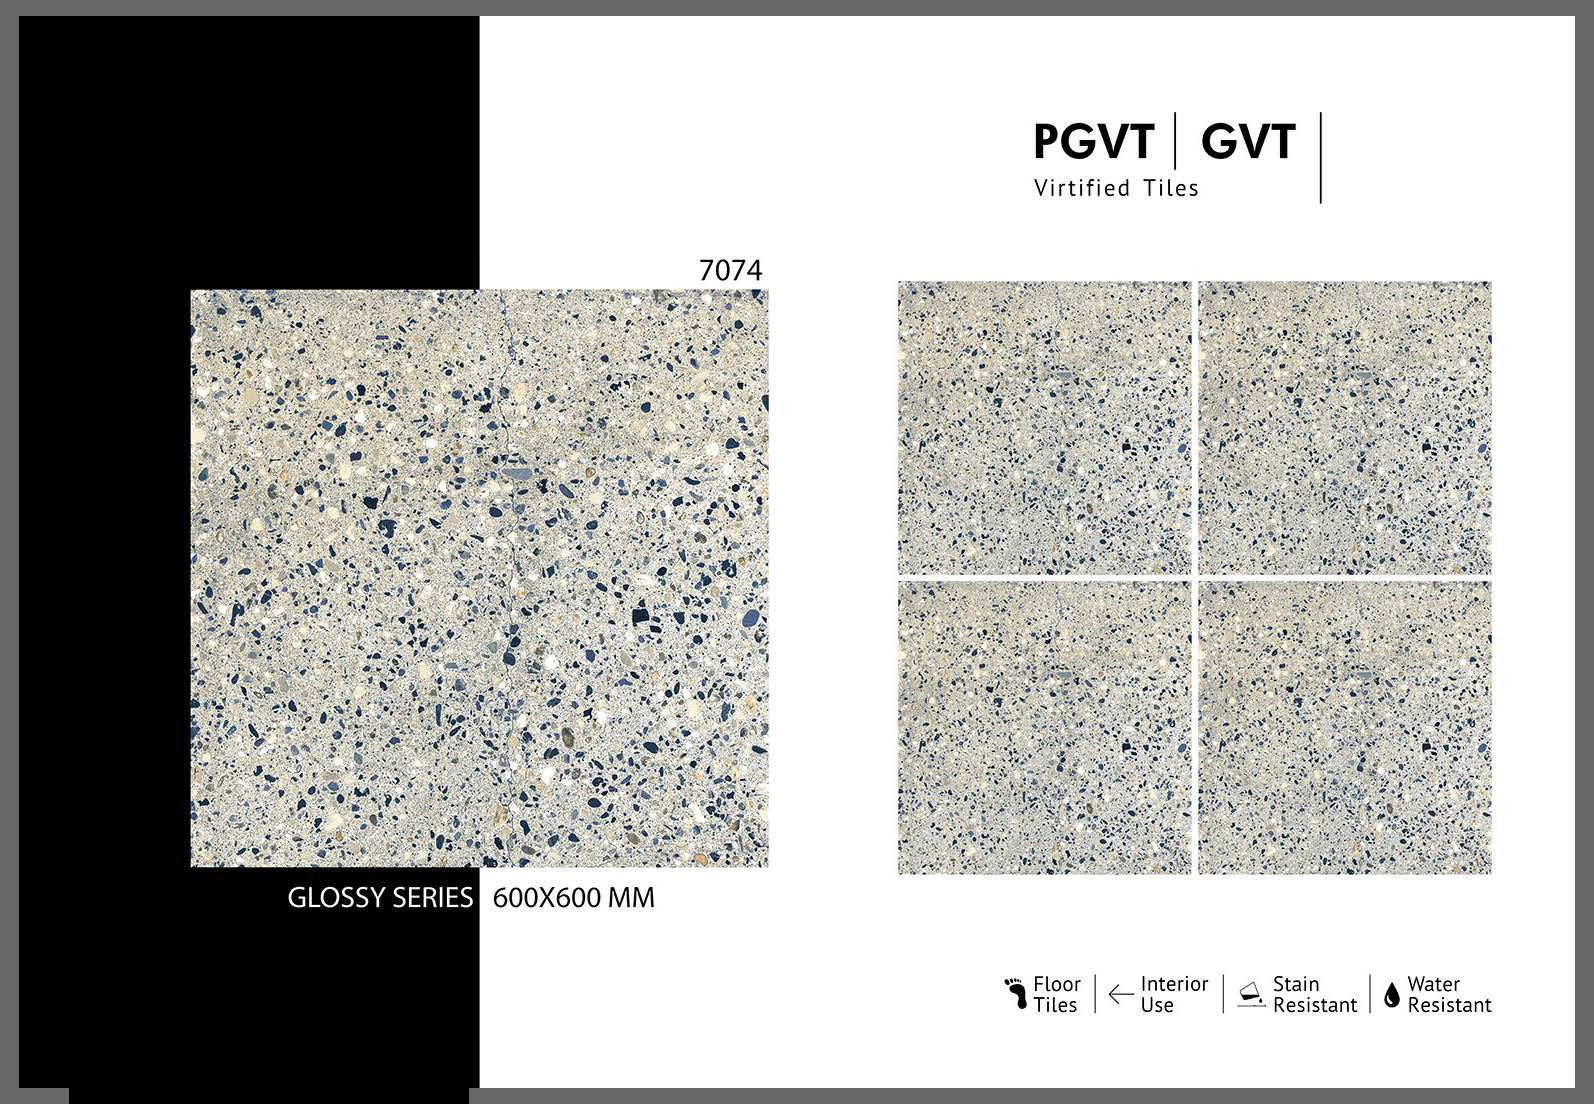 GVT 2X2 GLOSSY_Page_61.jpg